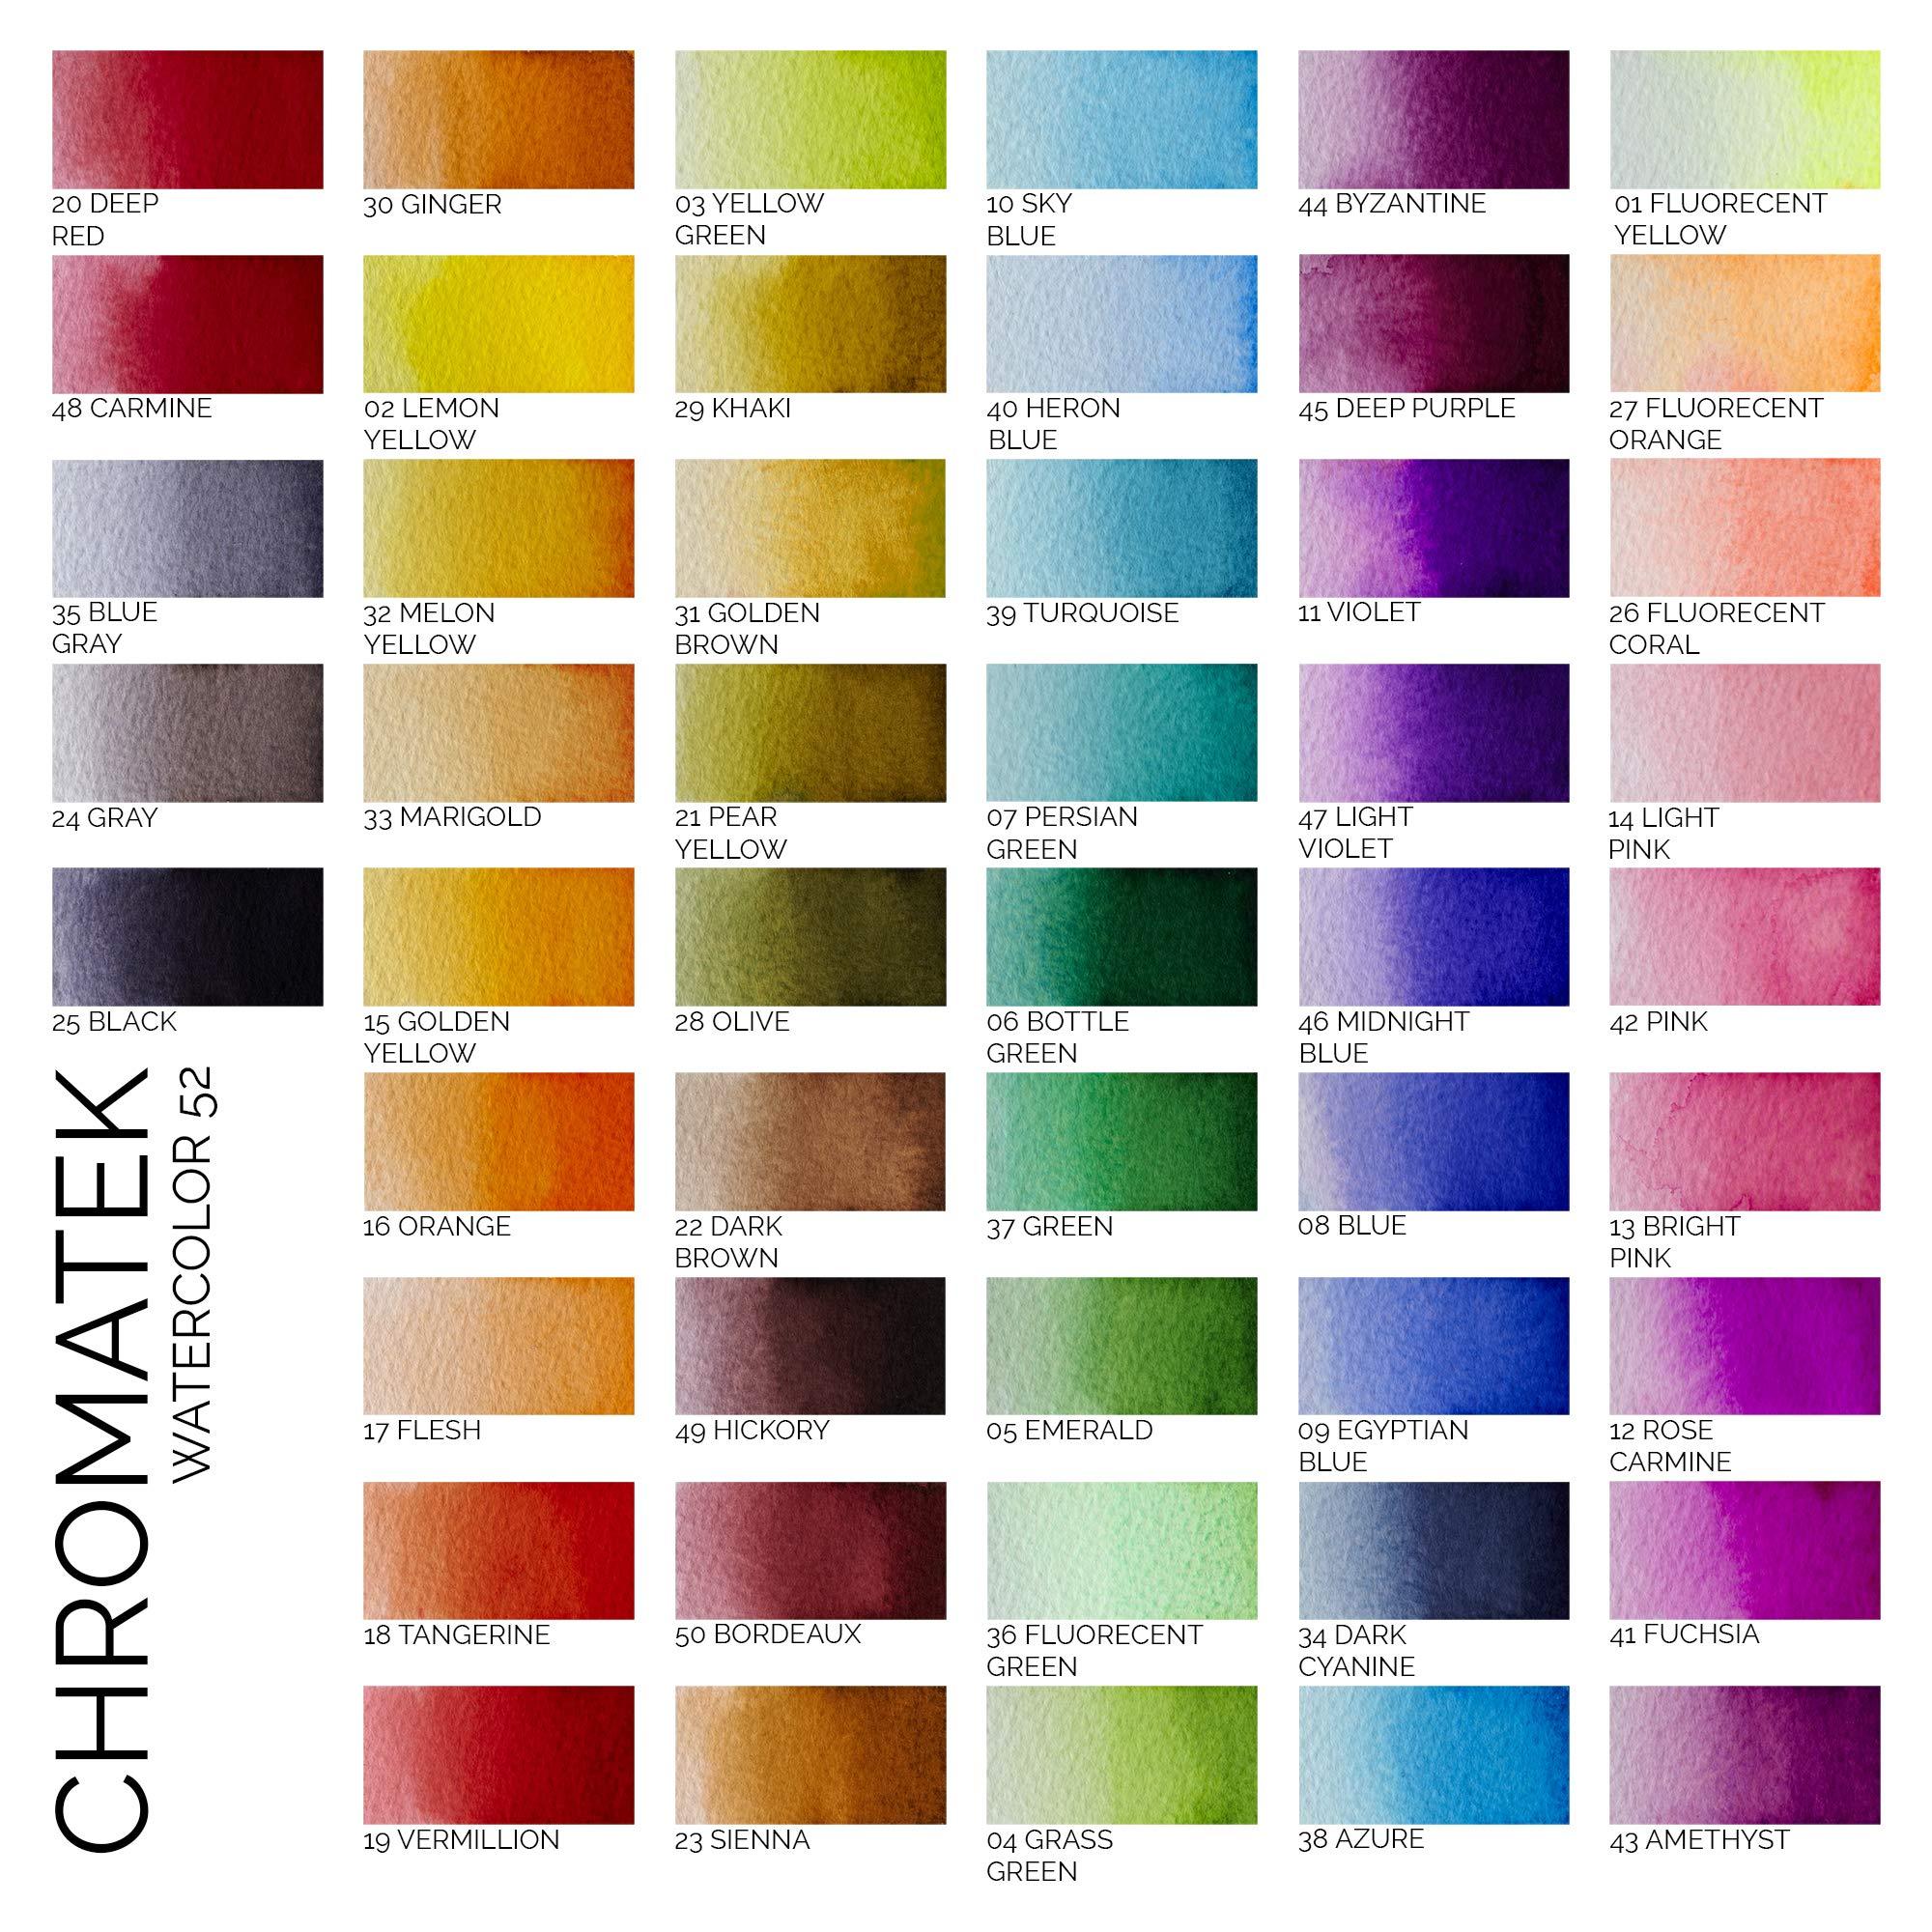 52 Watercolor Brush Pens, Tutorial Pad & Video Series by Chromatek. Real Brush Tip. Vivid. Smooth. Blendable. Long Lasting. Professional Artist Quality. 50 Colors 2 Blending Brushes. by Chromatek (Image #7)